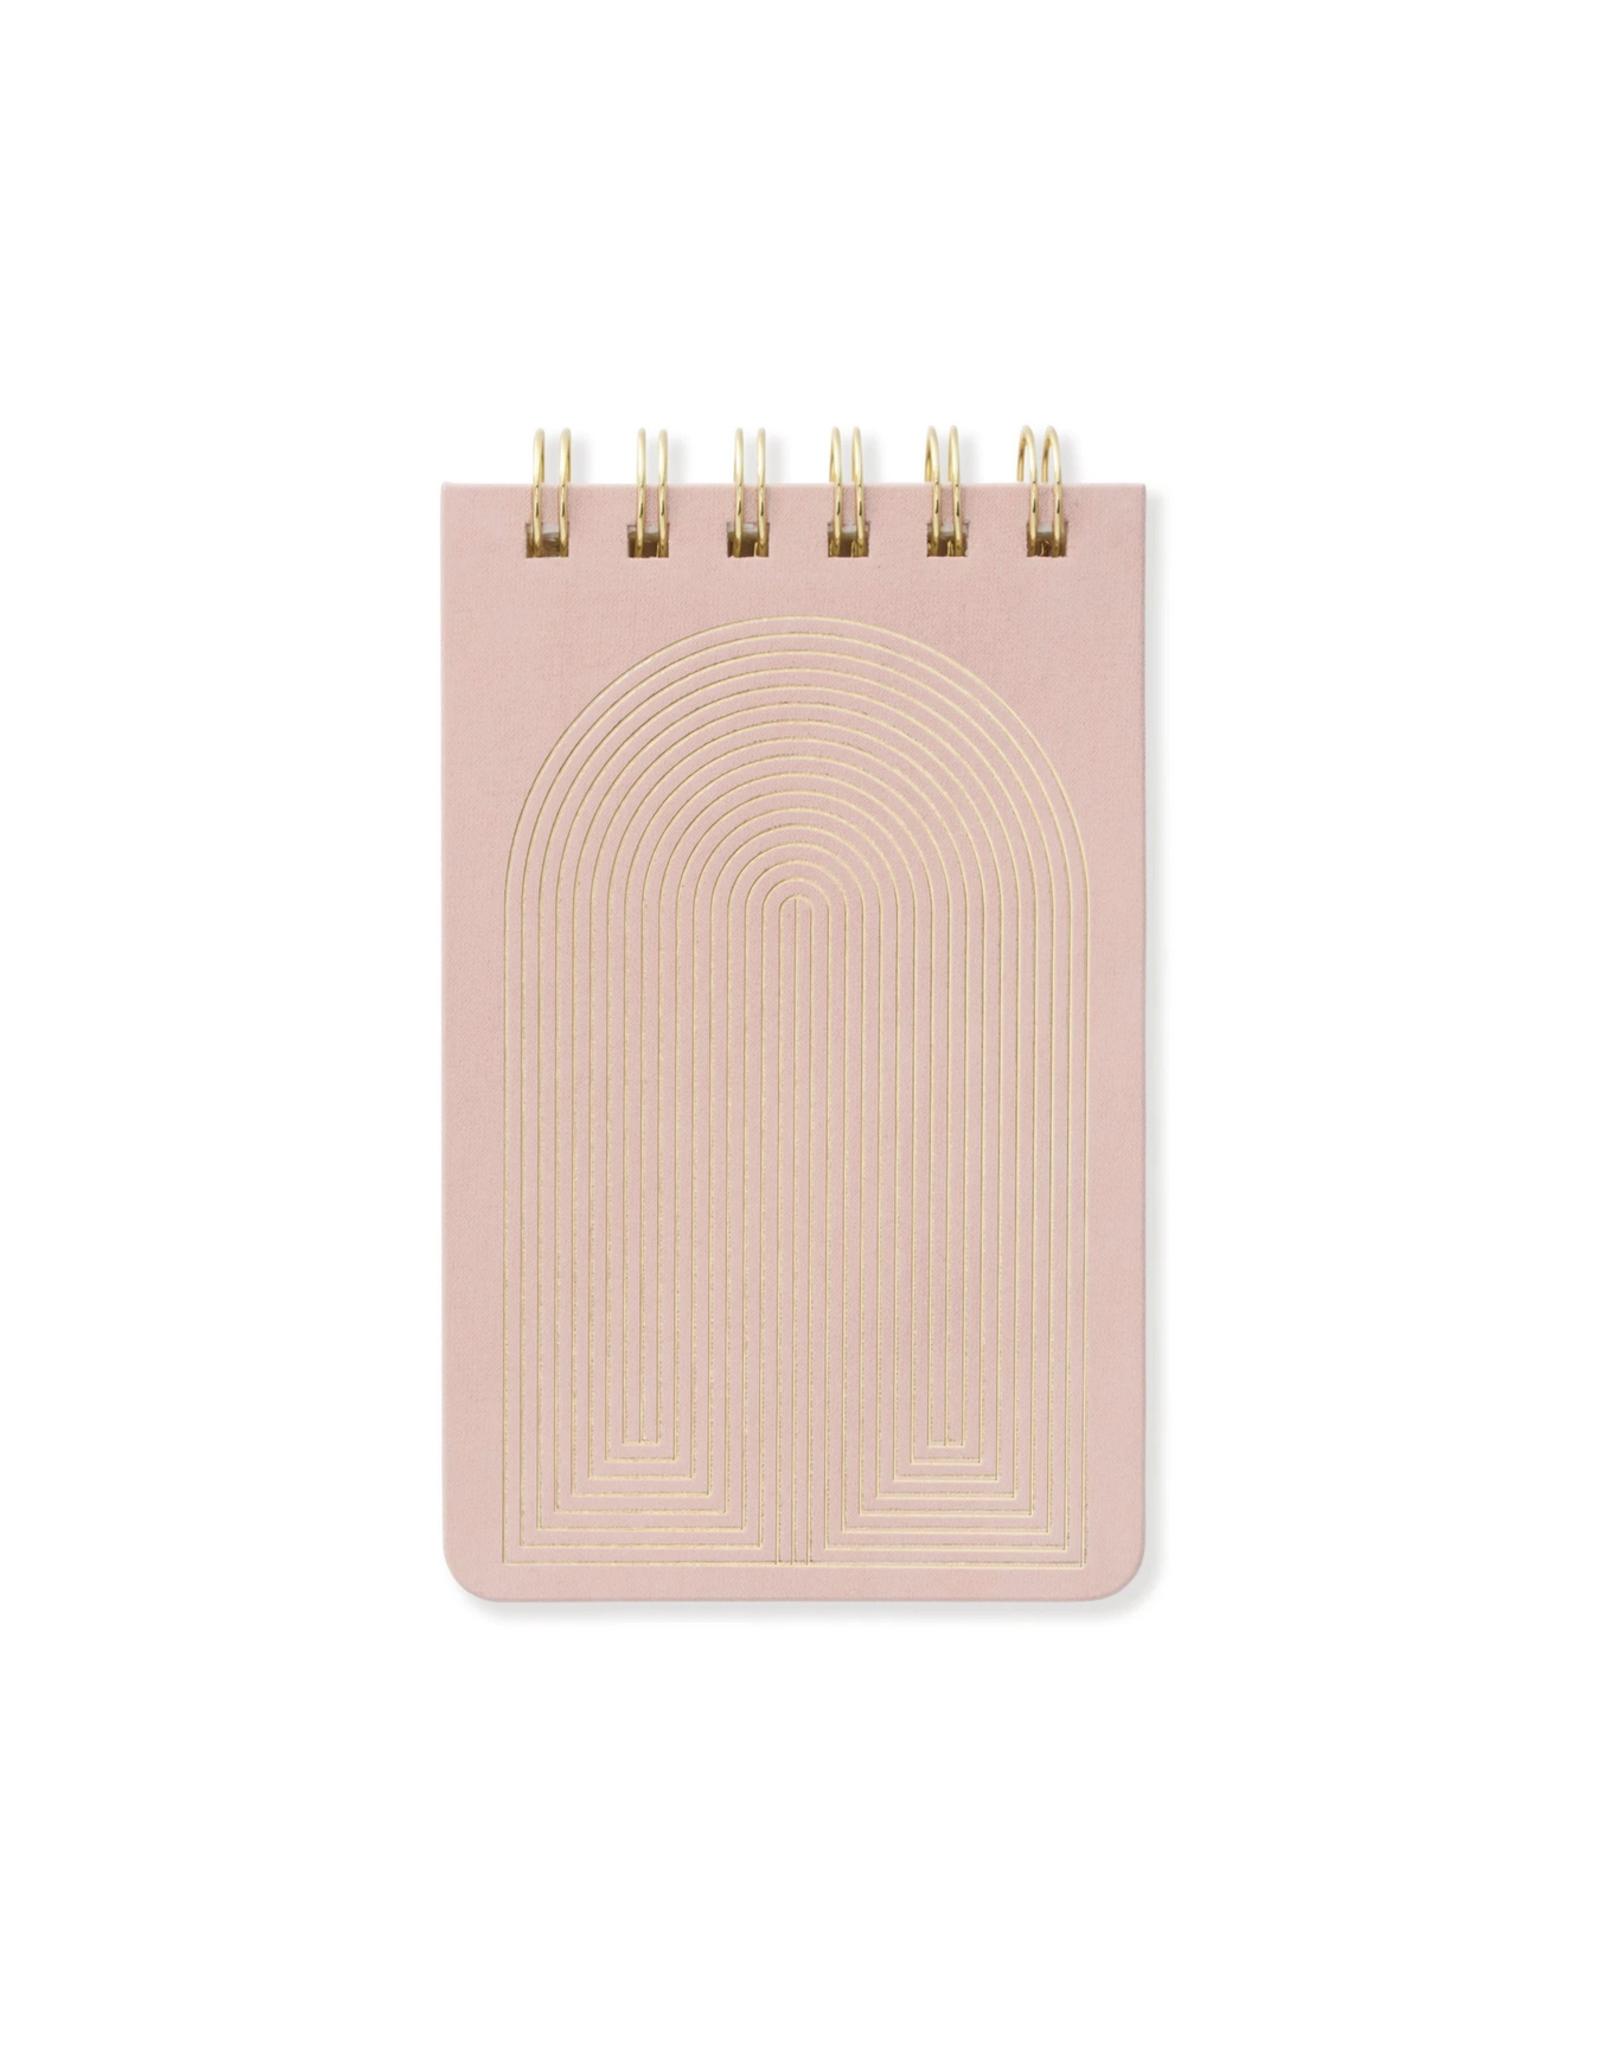 Dusty Blush Radiant Rainbow Notepad